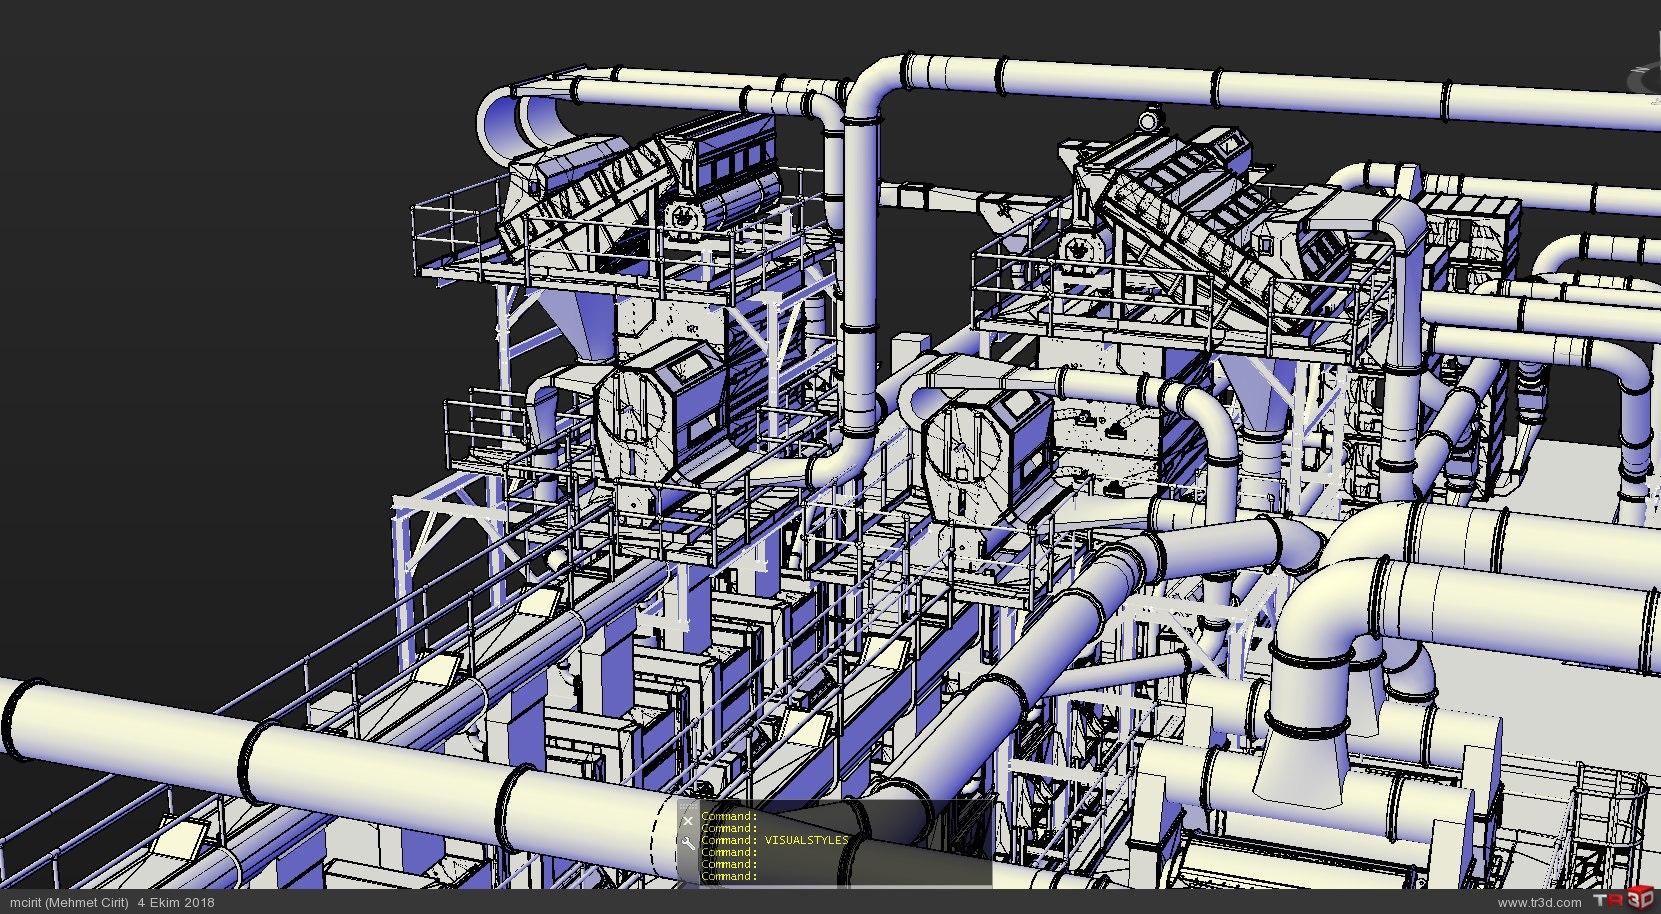 Çalık Urfa Ginning Plant 4